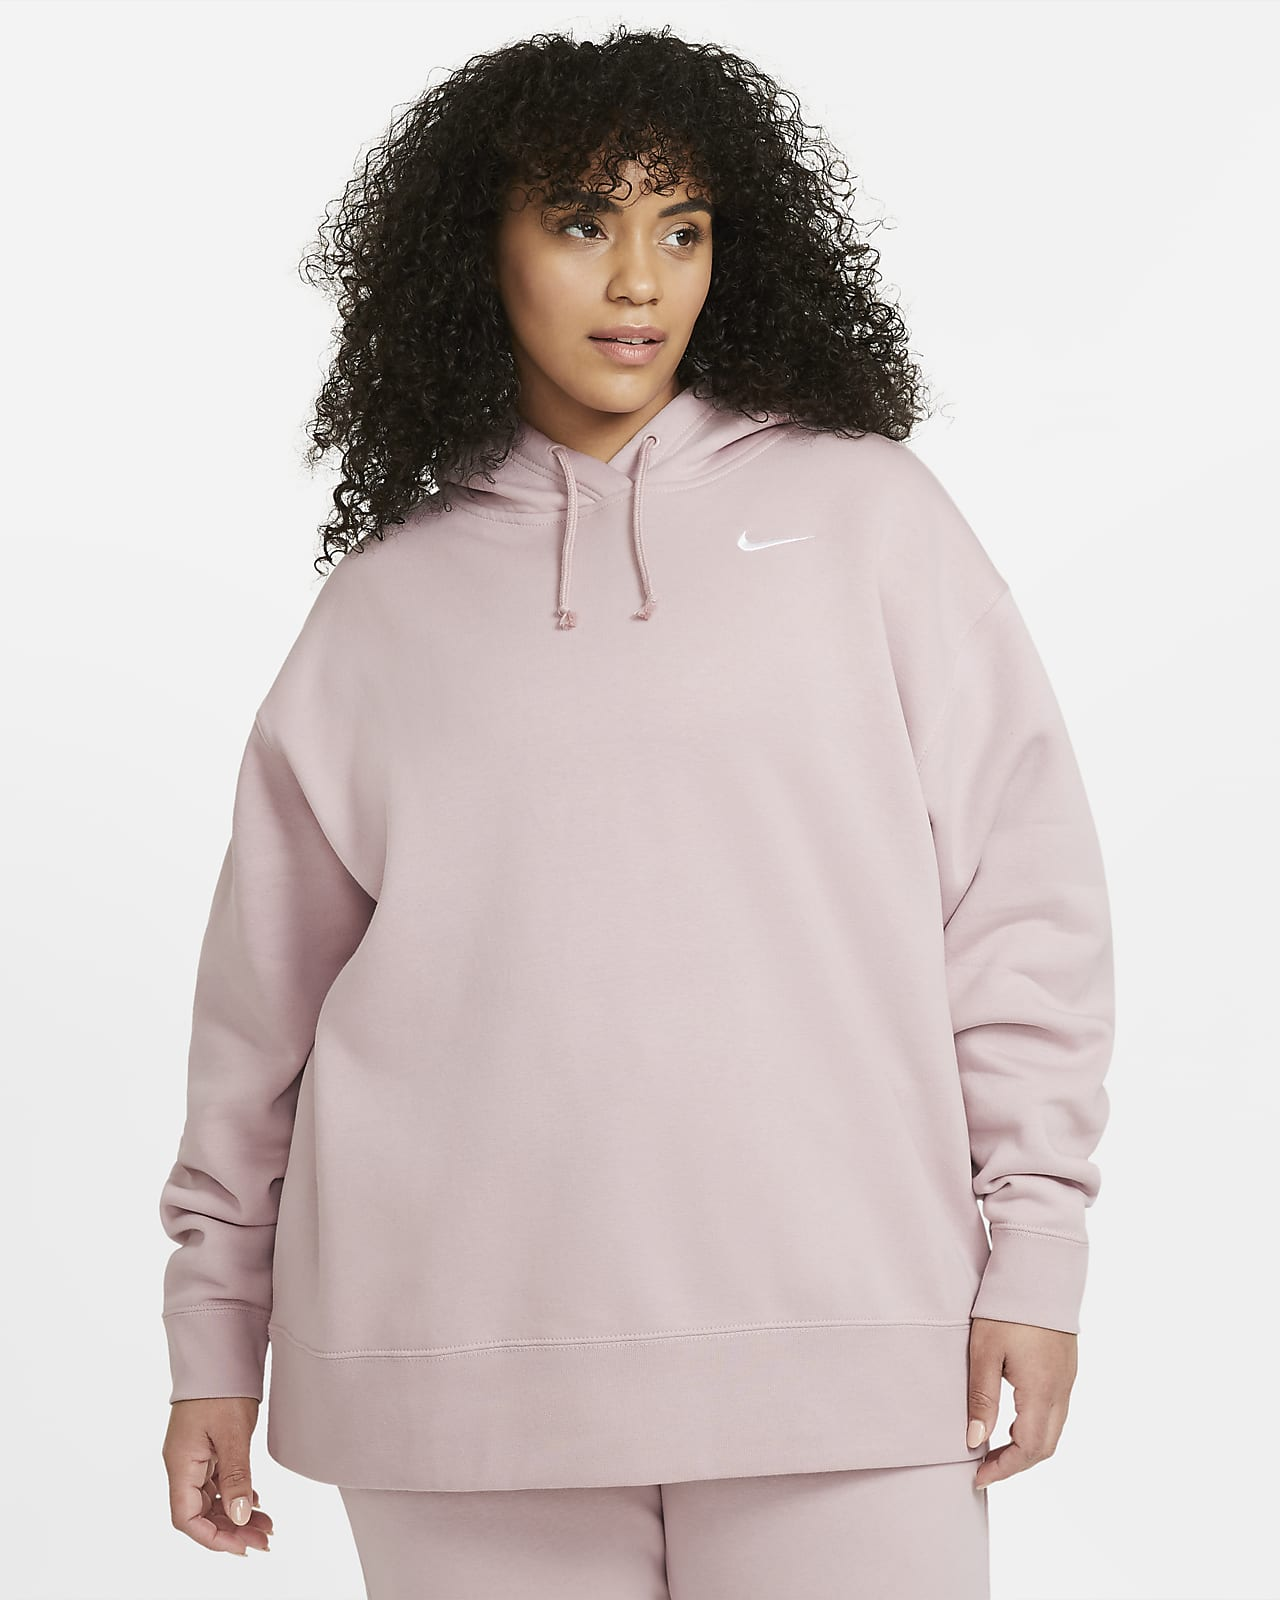 Nike Sportswear Sudadera de tejido Fleece (Talla grande) - Mujer